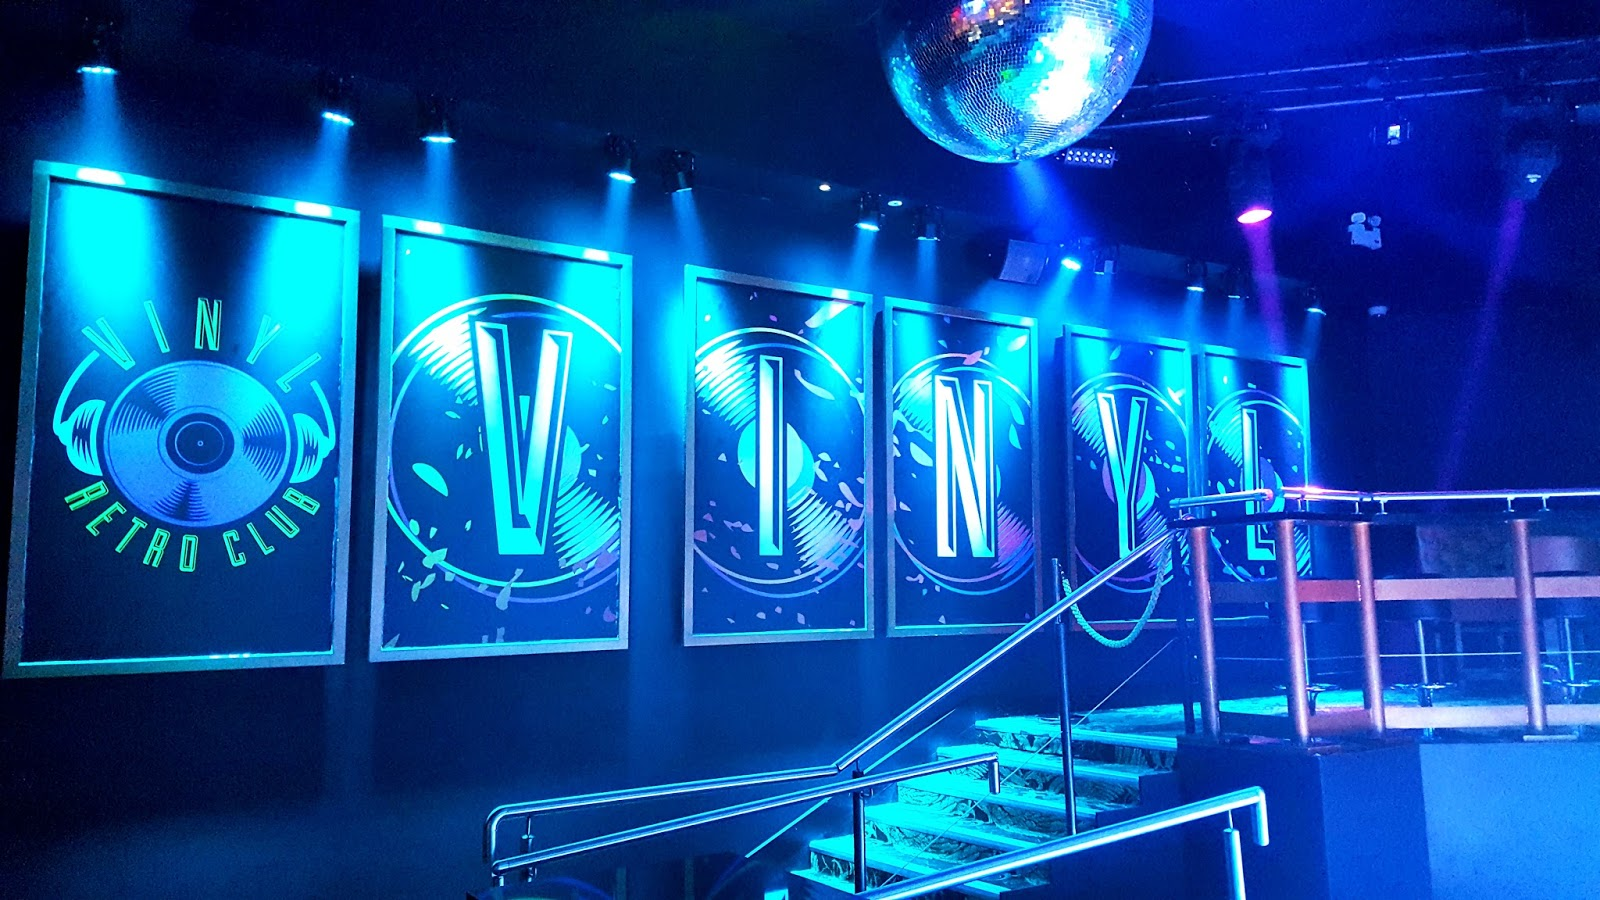 Vinyl Retro Club in Fiction Swansea Nightclub